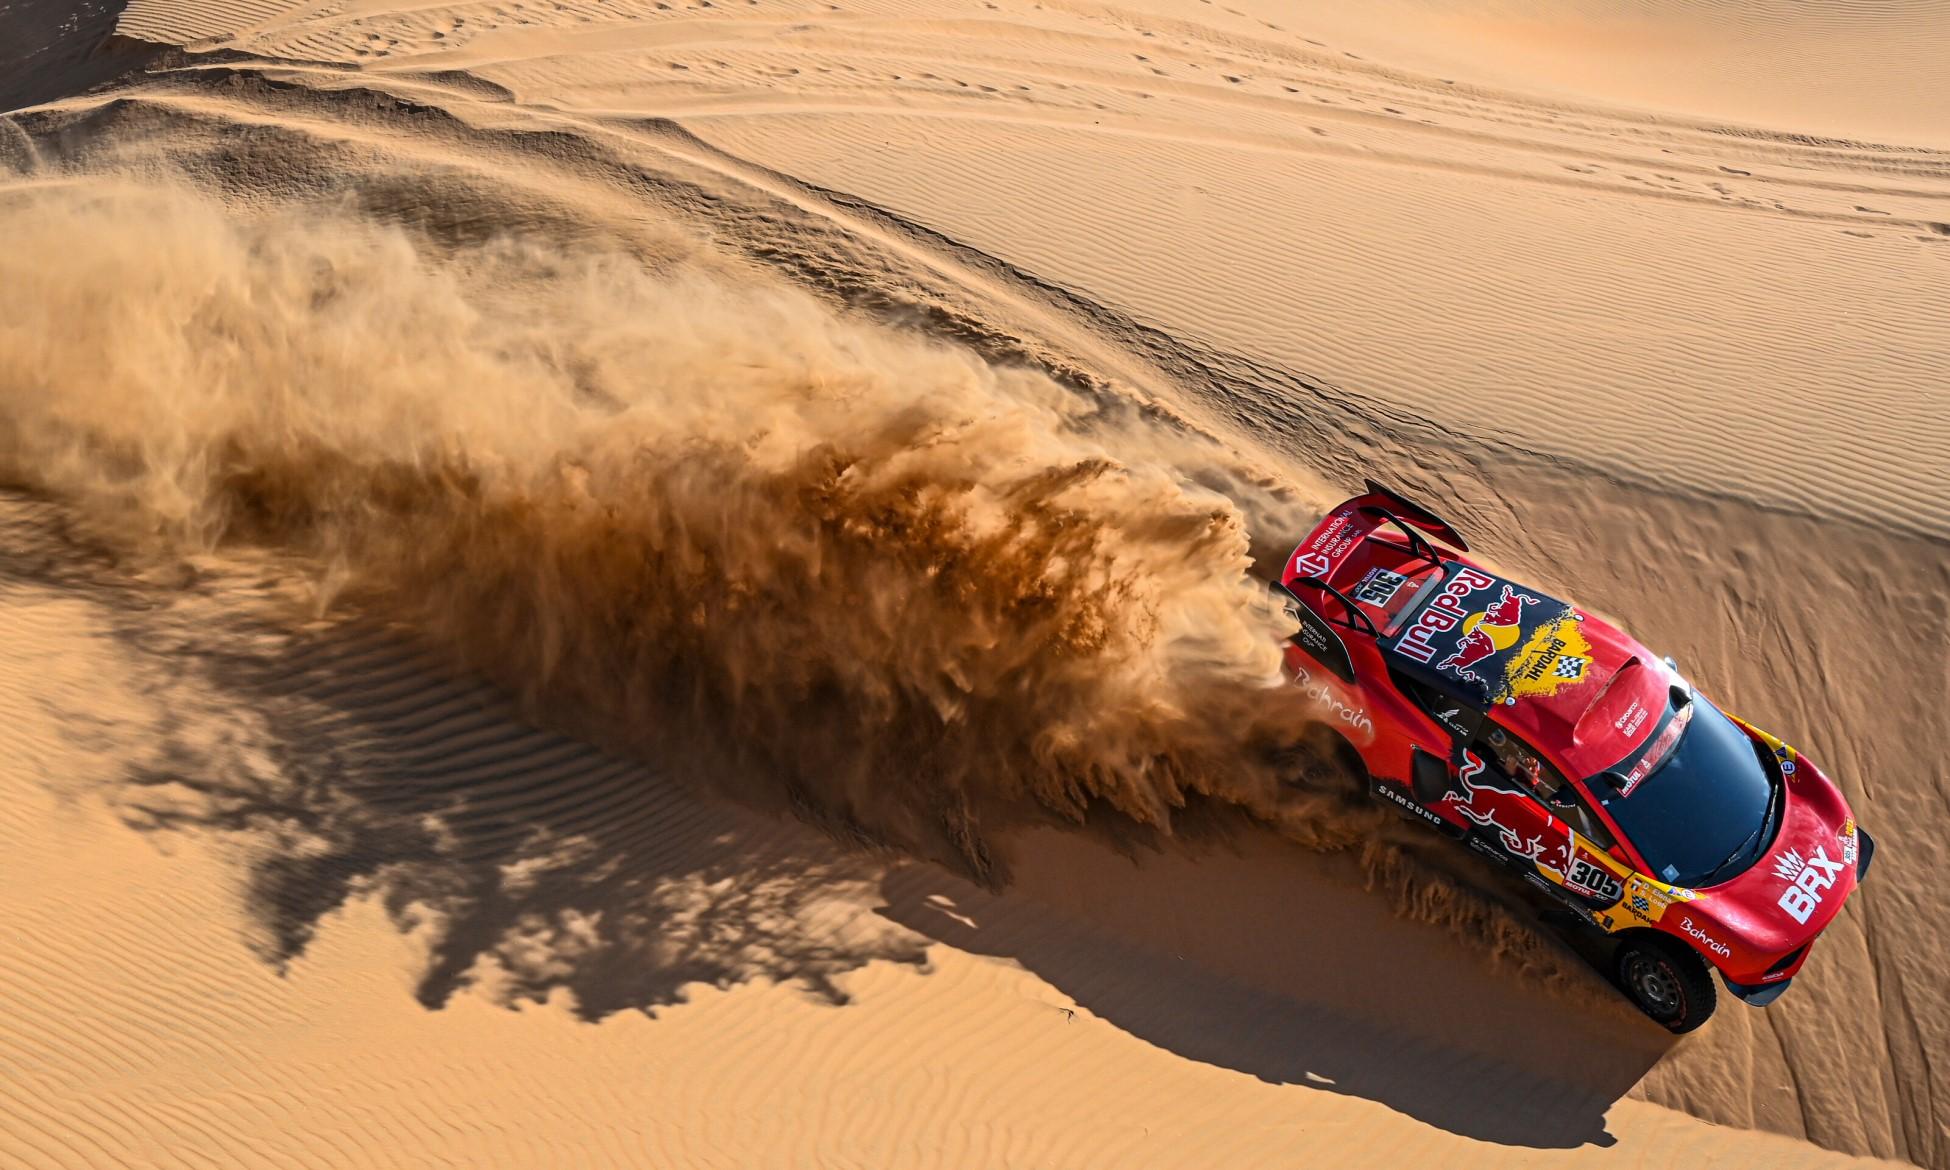 Sebastien Loeb on 2021 Dakar Stage 3